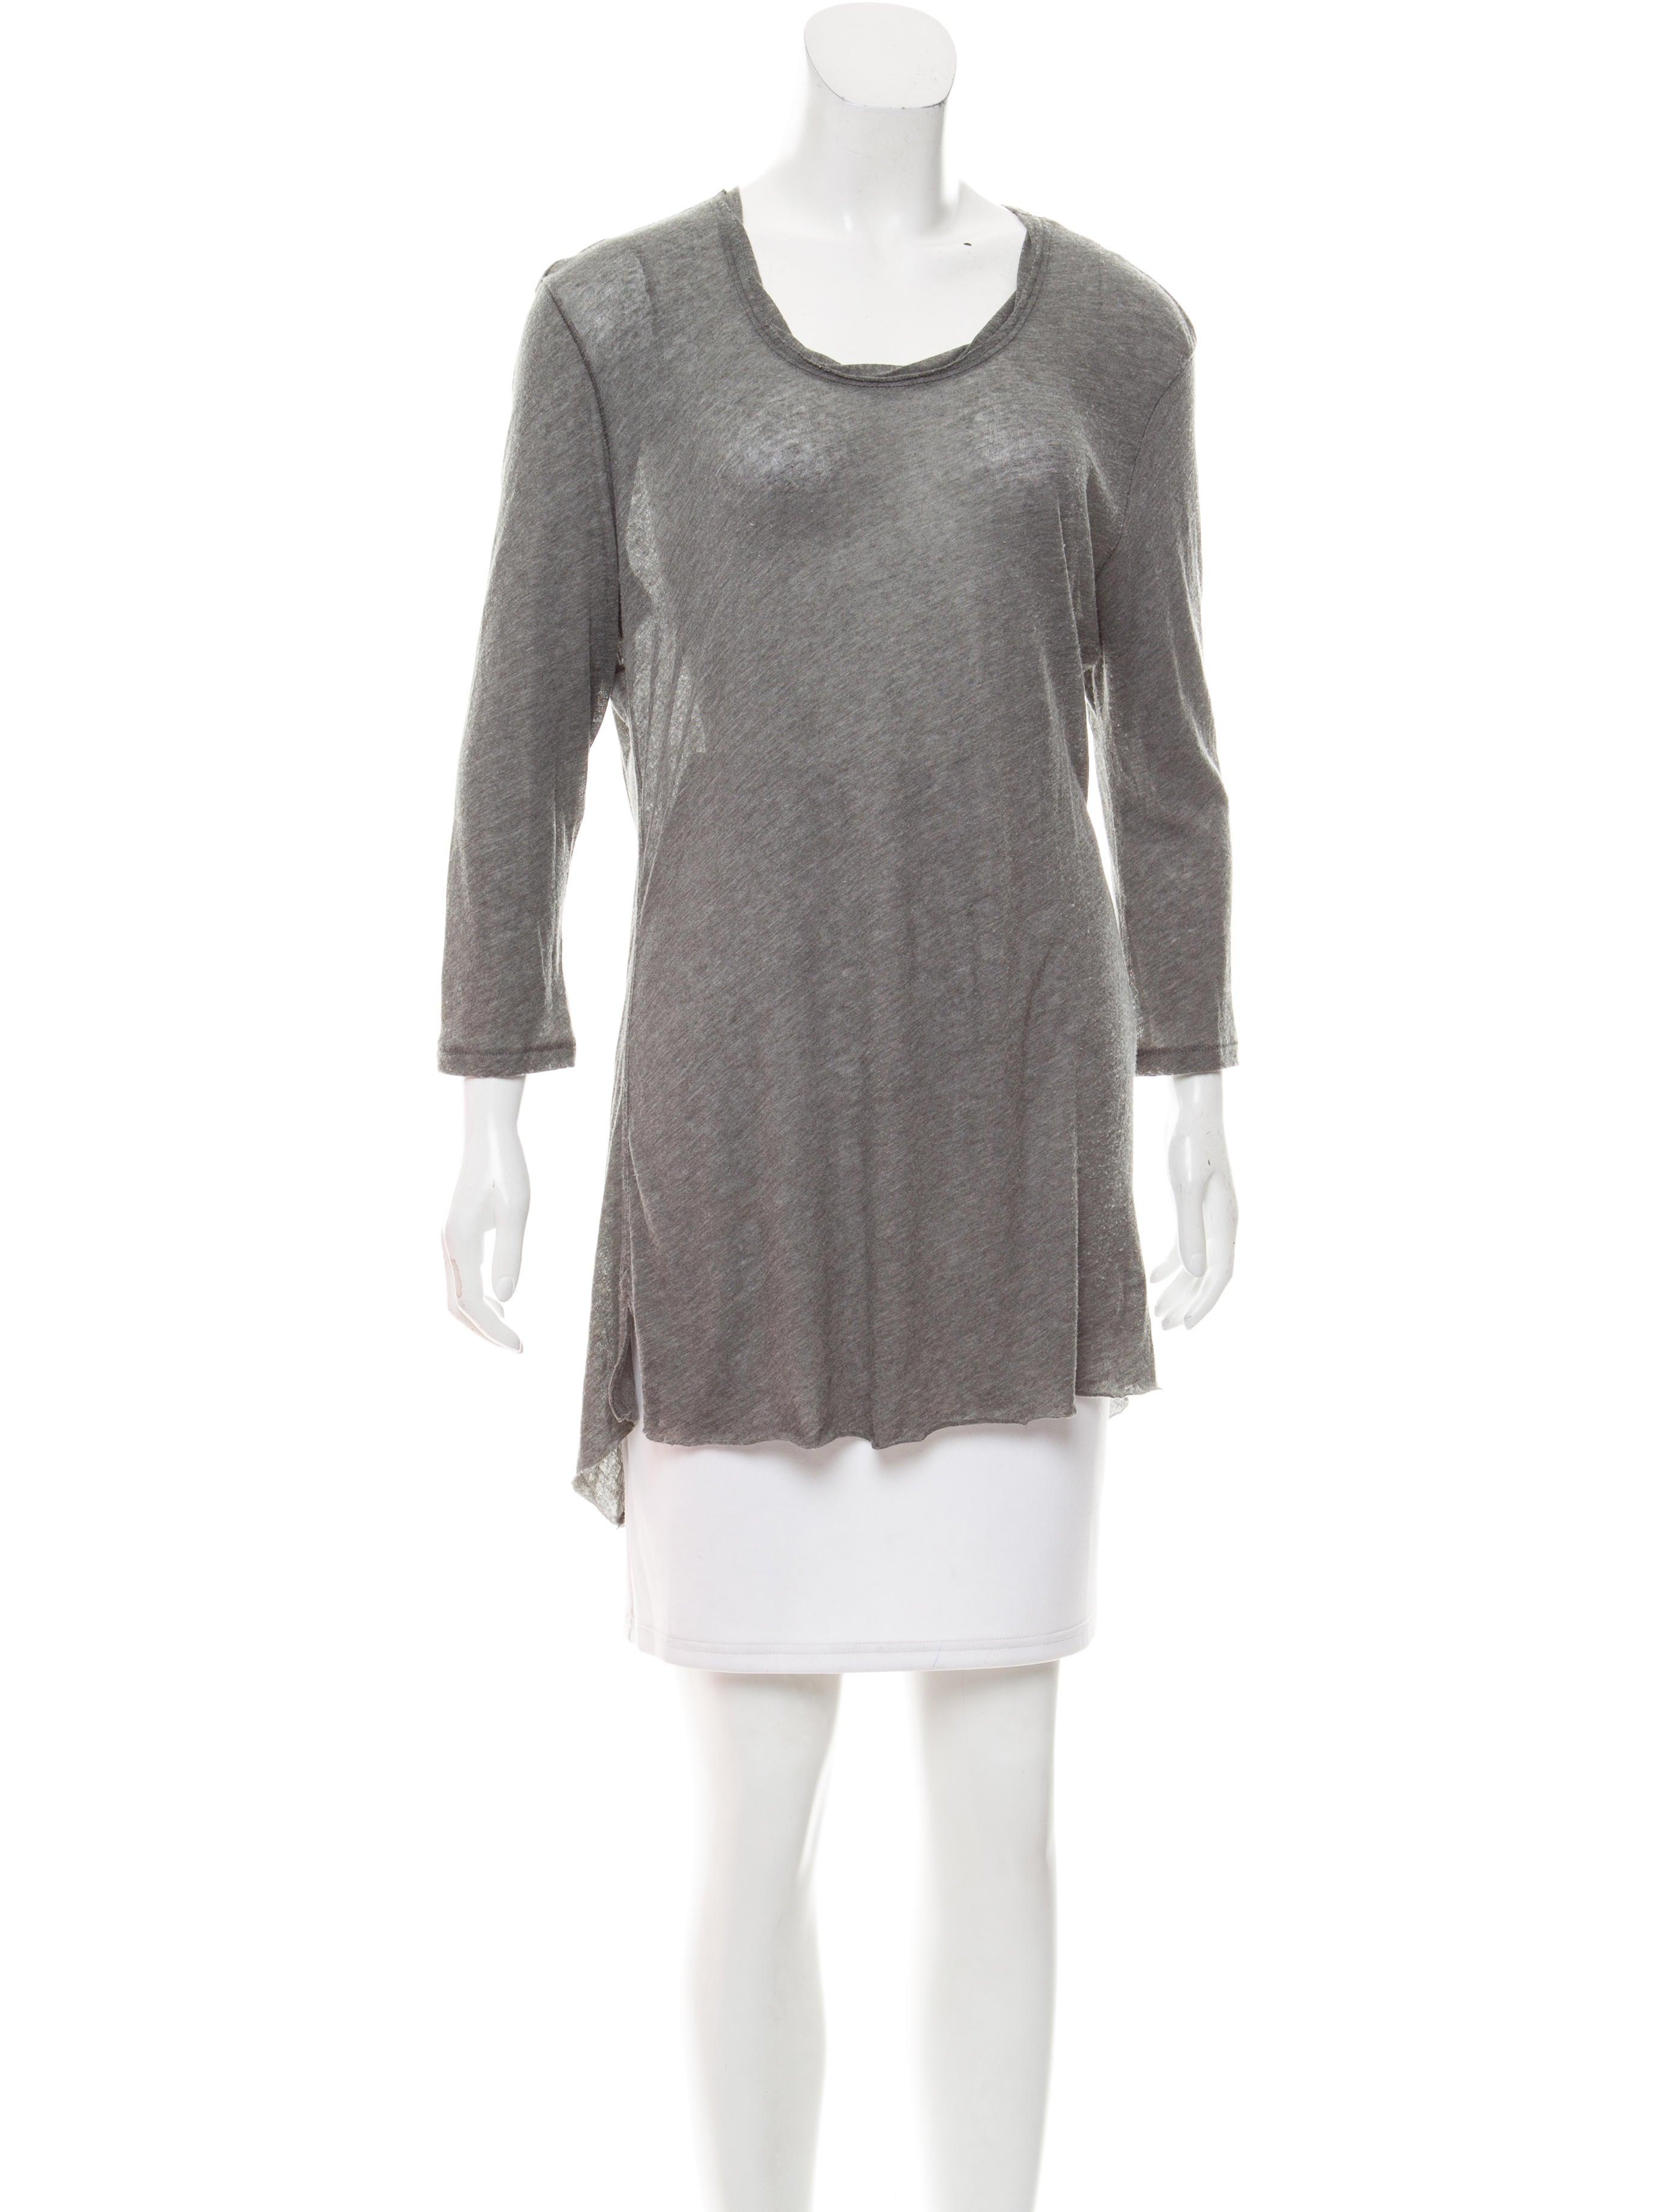 Rag bone long sleeve raw edge t shirt clothing for Raw edge t shirt women s